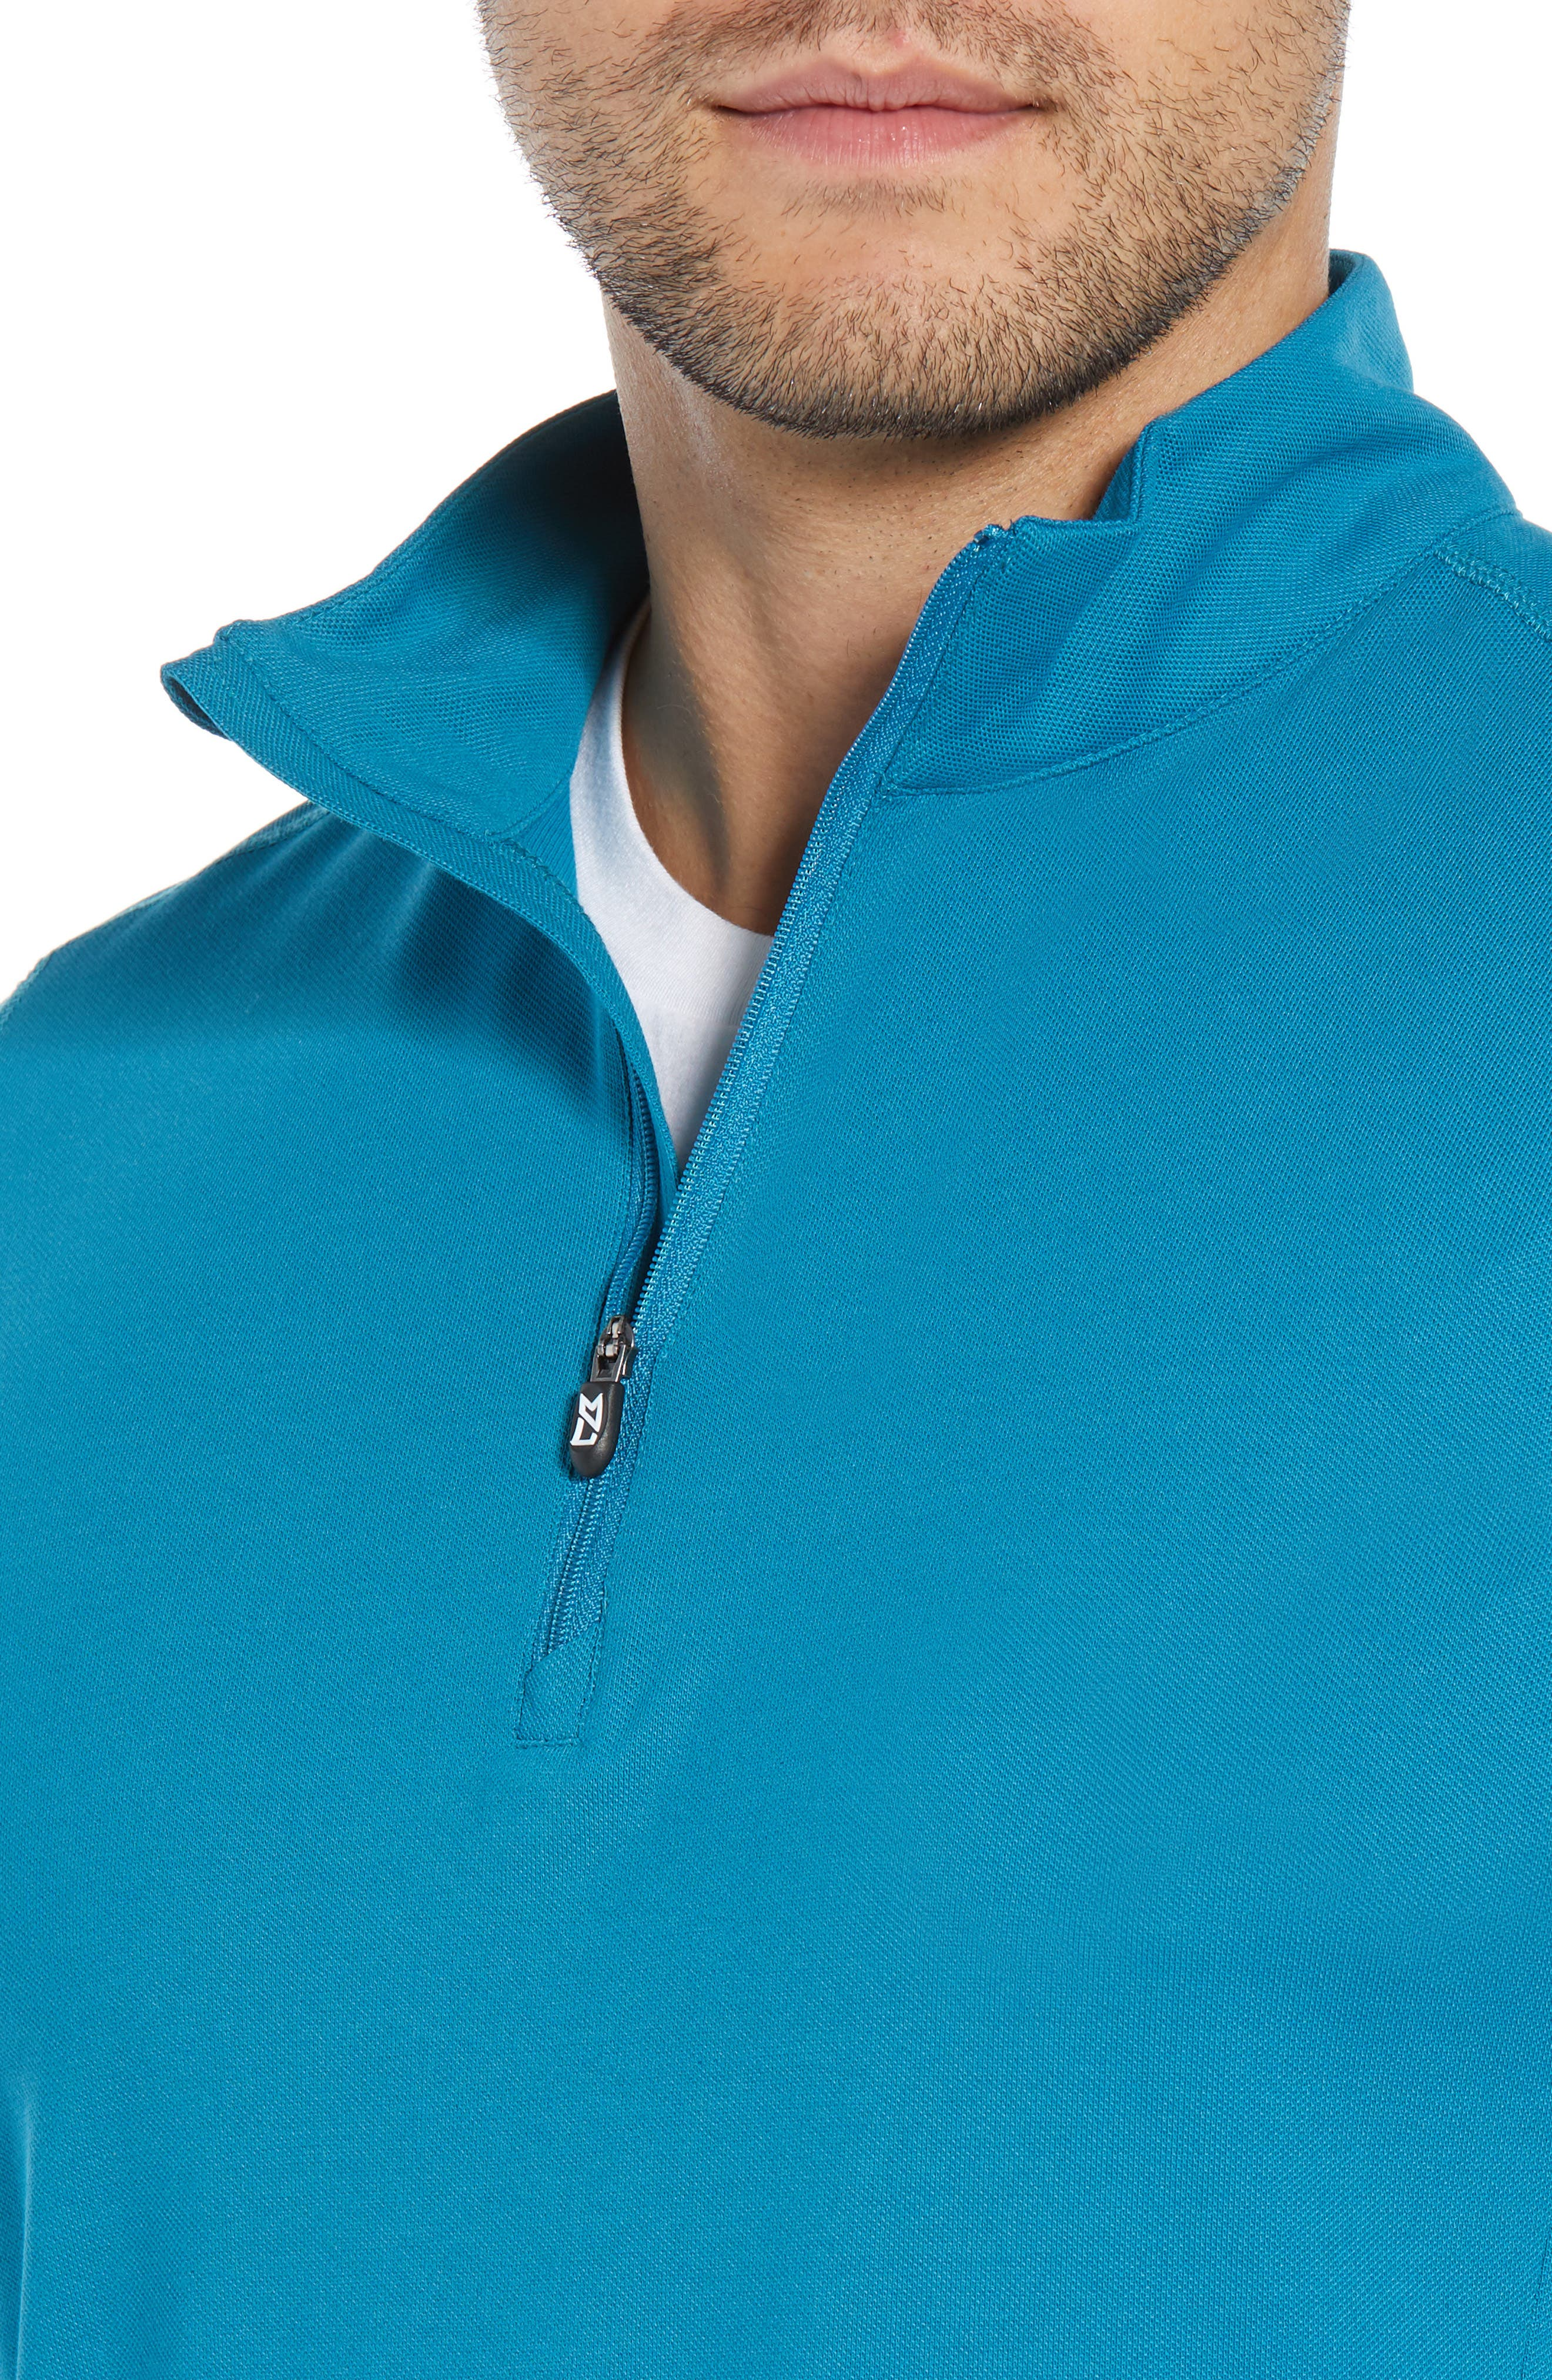 CUTTER & BUCK, Advantage Regular Fit DryTec Mock Neck Pullover, Alternate thumbnail 4, color, TEAL BLUE